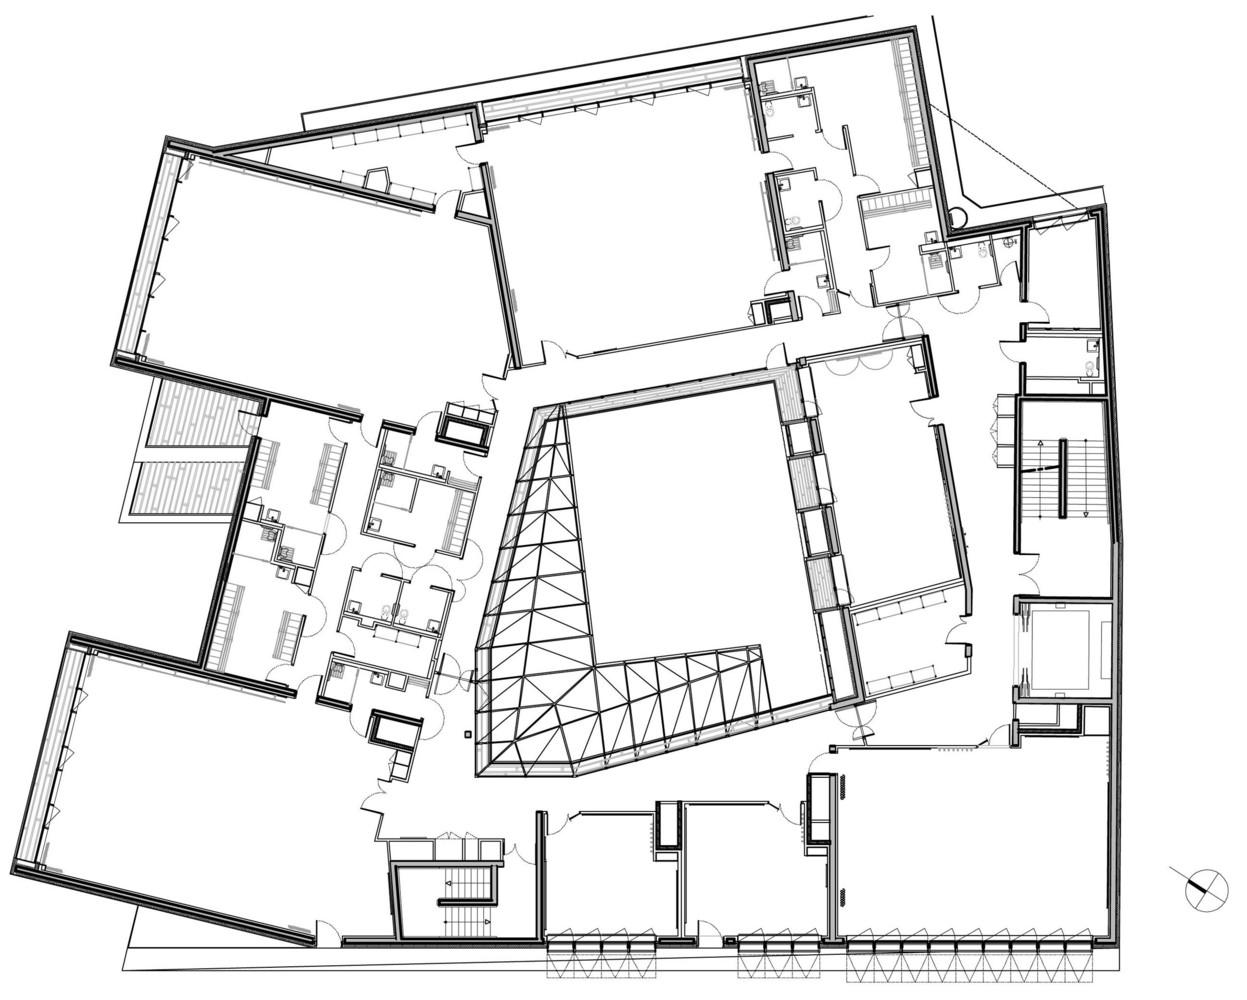 Gallery Of Music Conservatory In Paris 17th Arrondissement Basalt Architecture 27